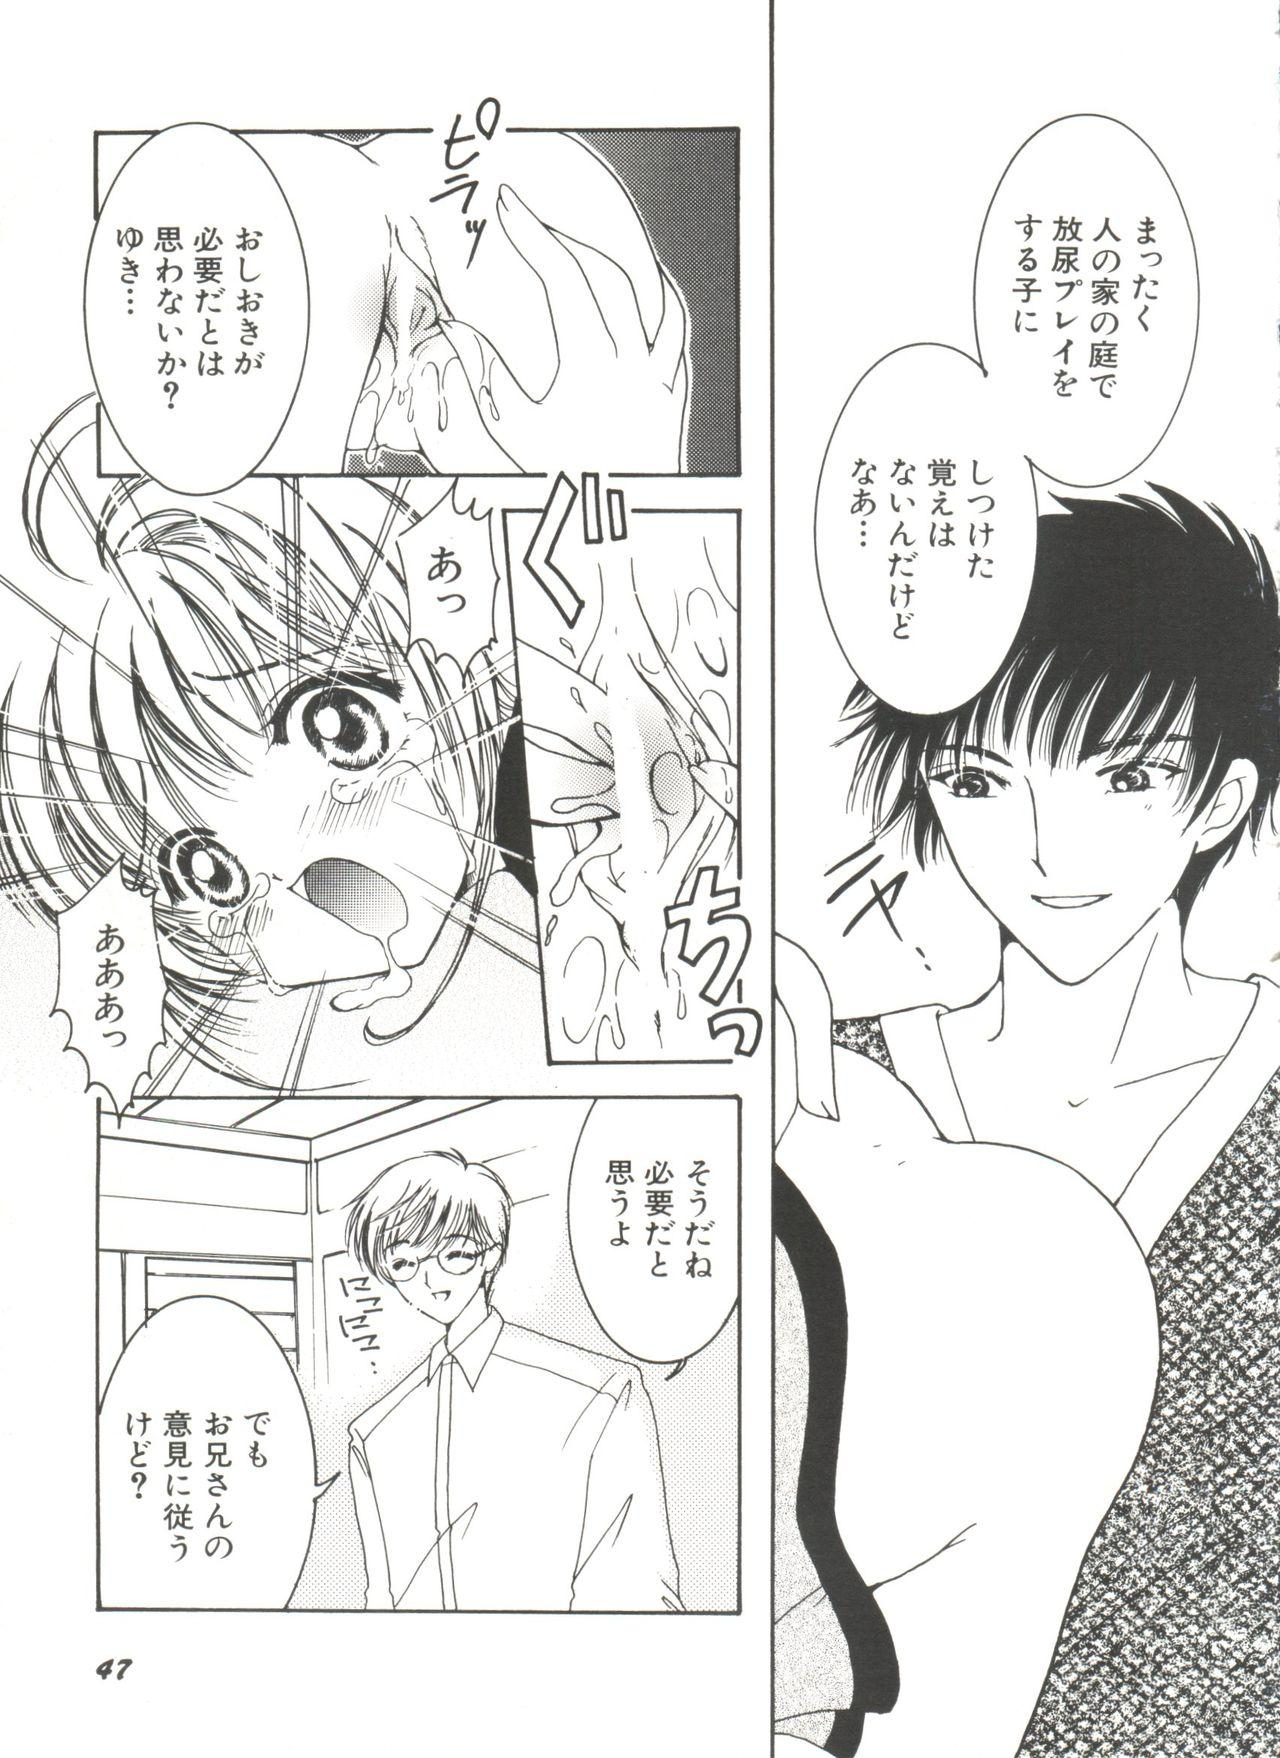 [Anthology] Denei Tamatebako 8 - Utakata no Tenshi-tachi II (Various) 48